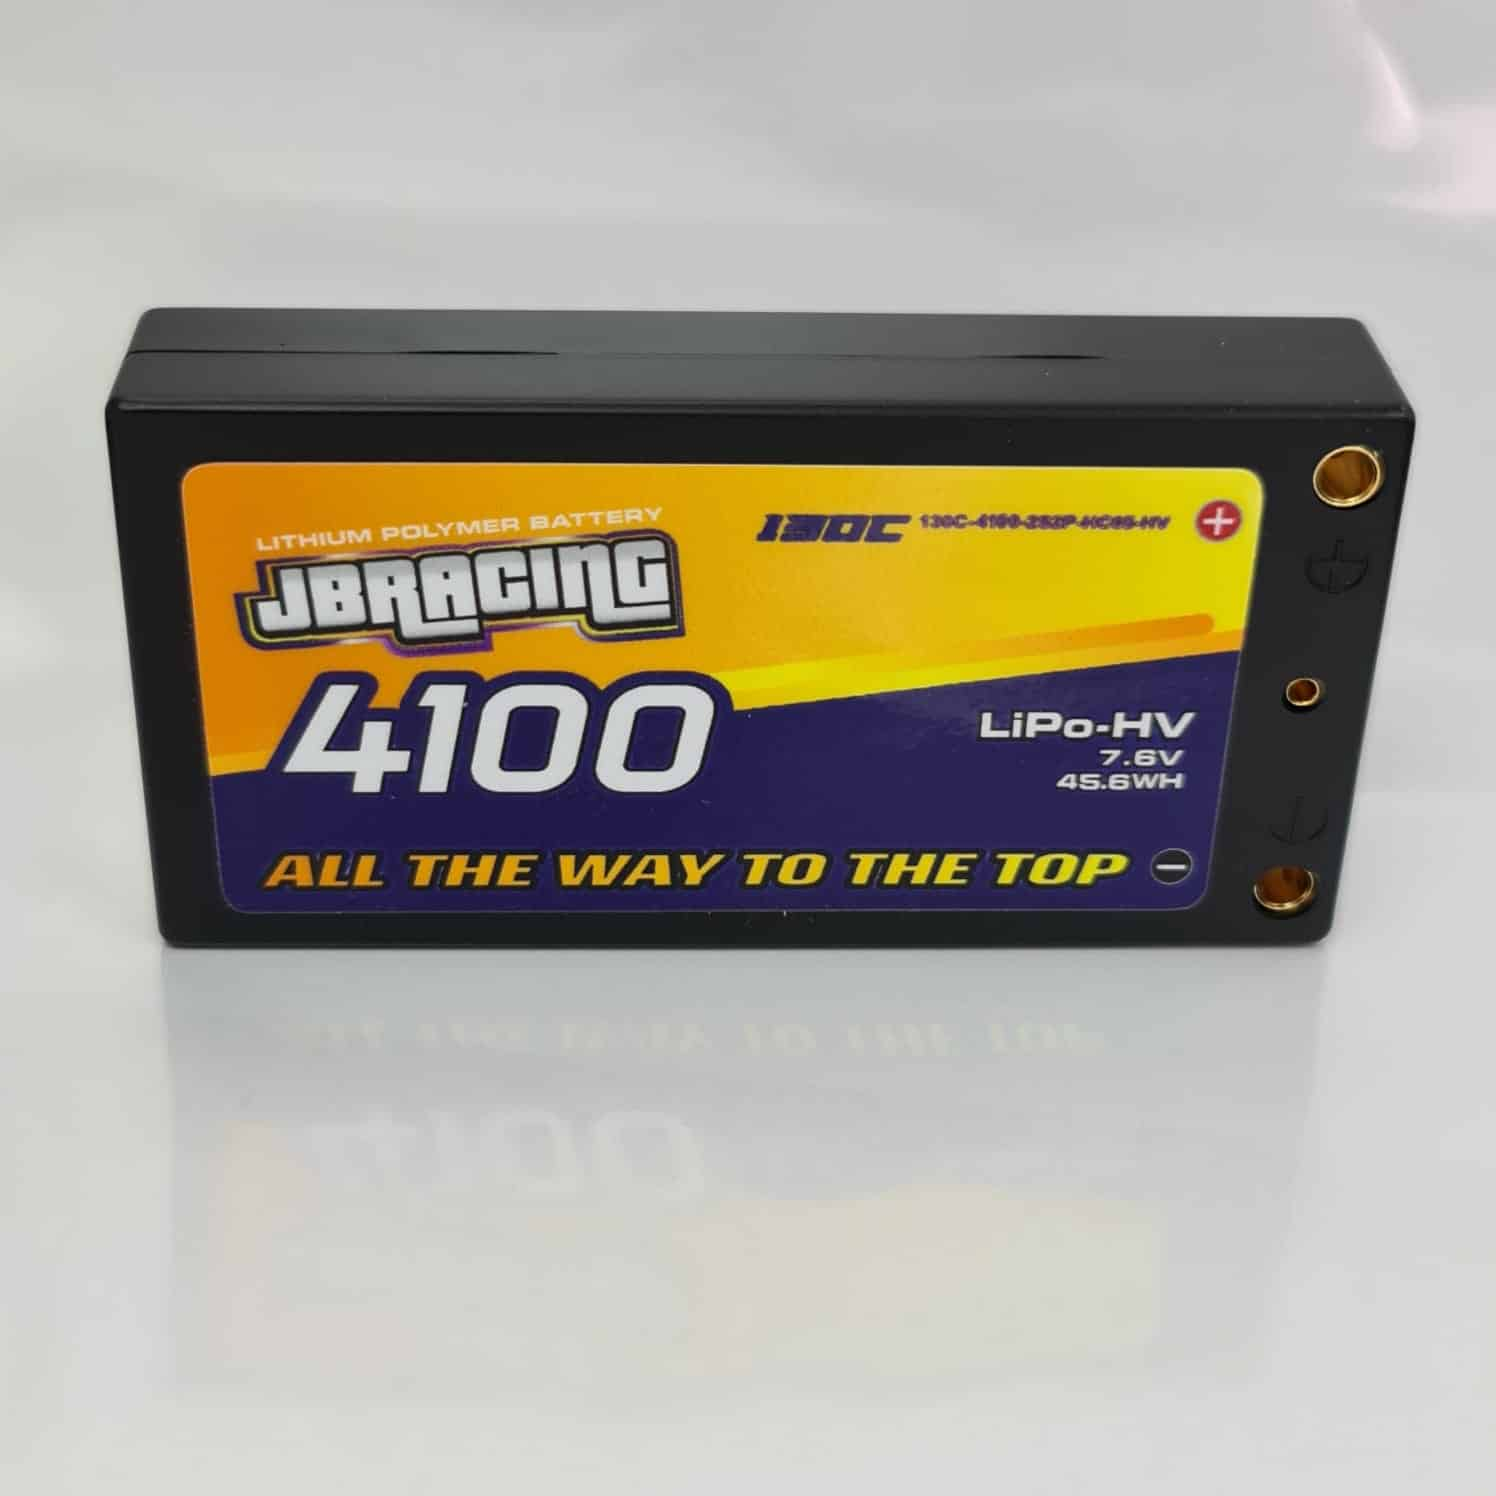 JBRacing LiPO-HV battery 7.6v 4100mah LP shorty